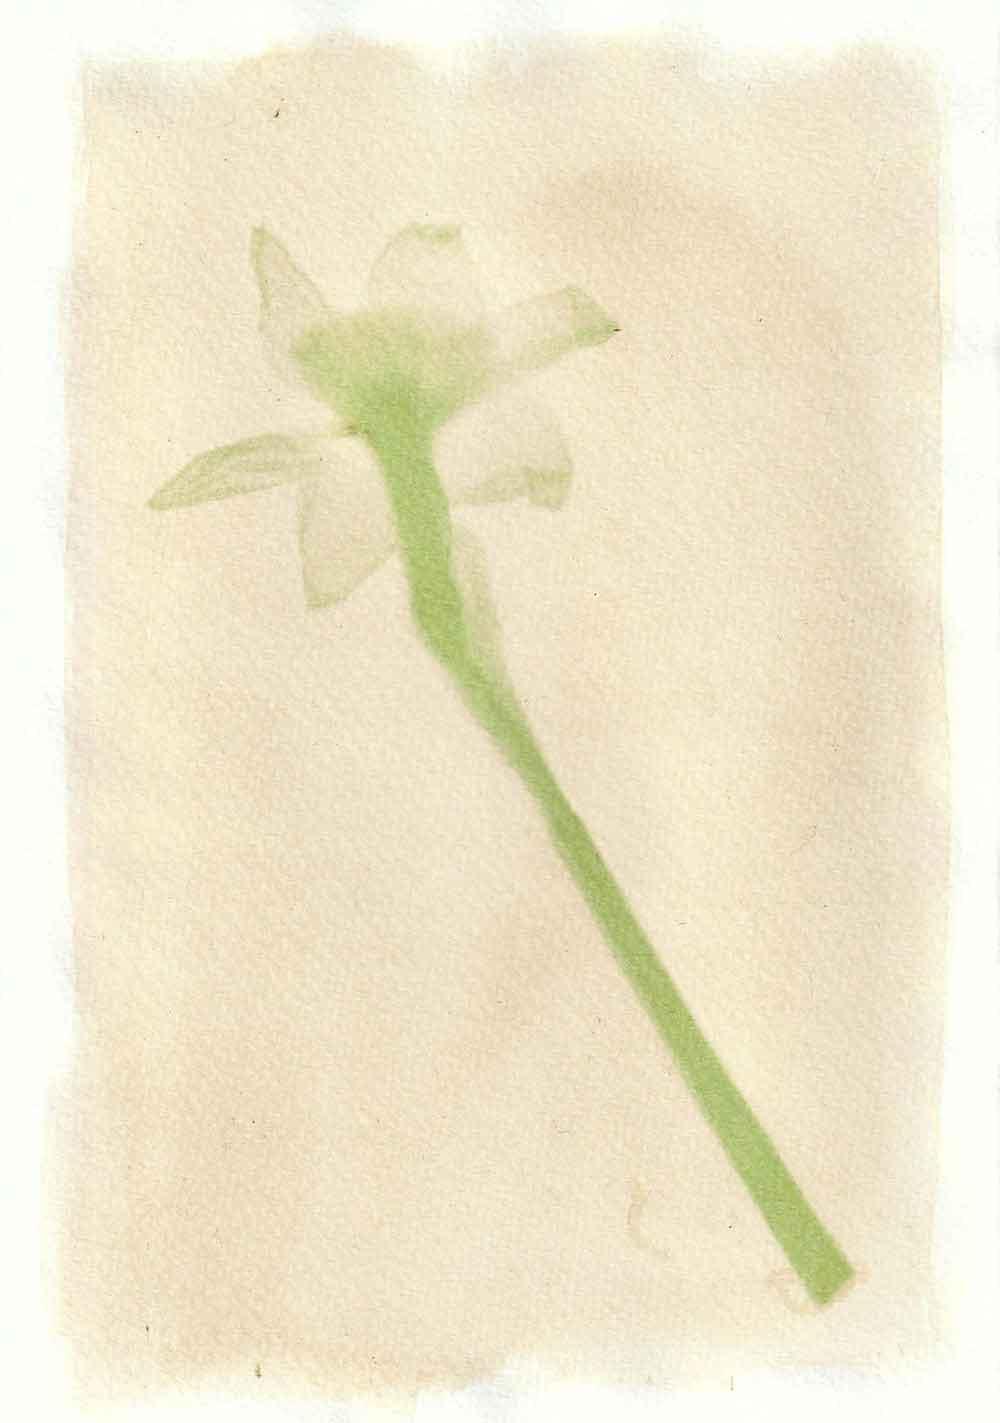 Daffodil anthotype prints by Tim Boddy